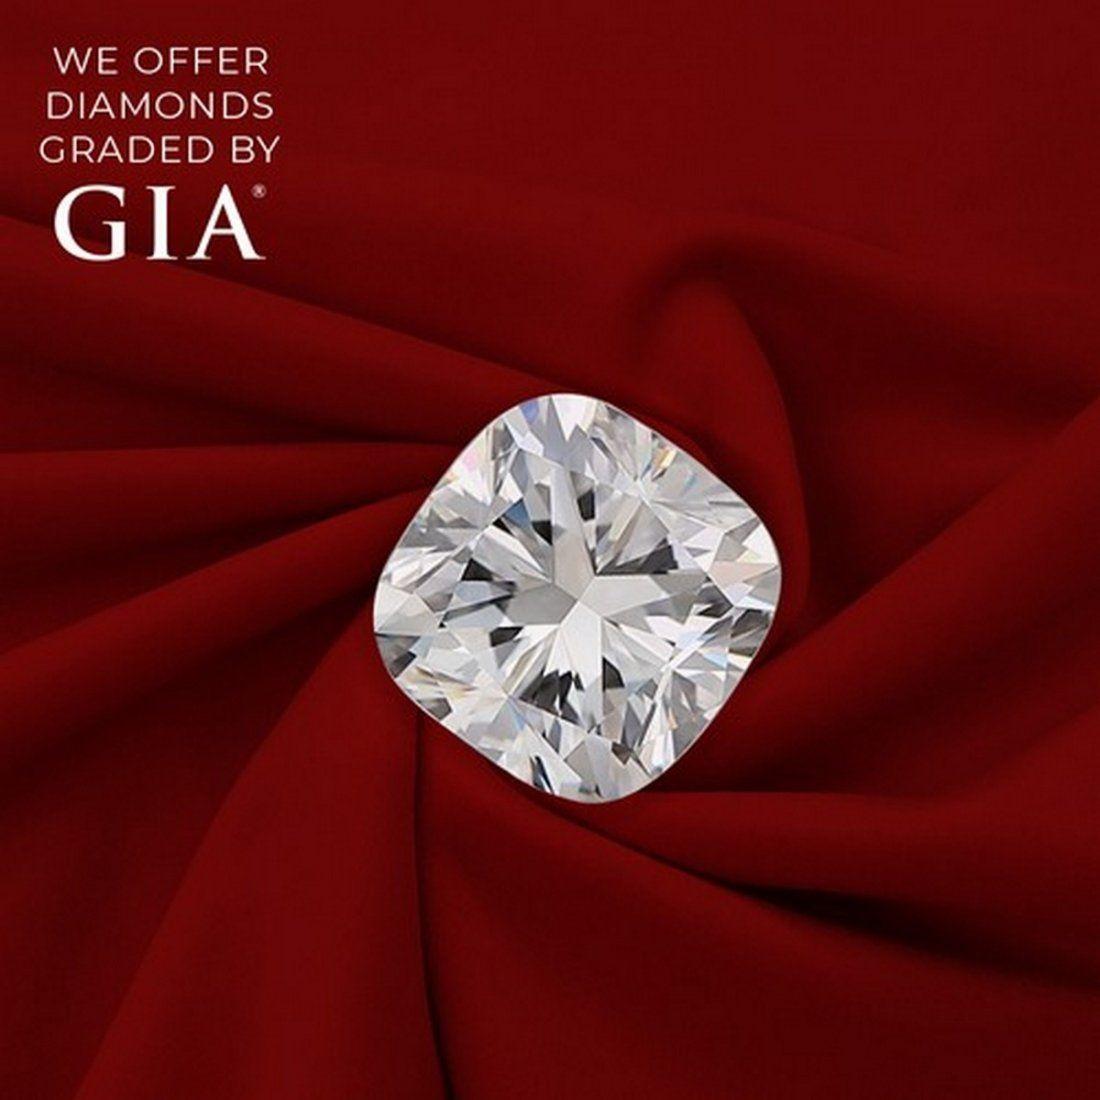 3.01 ct, Color F/VVS2, Cushion cut Diamond